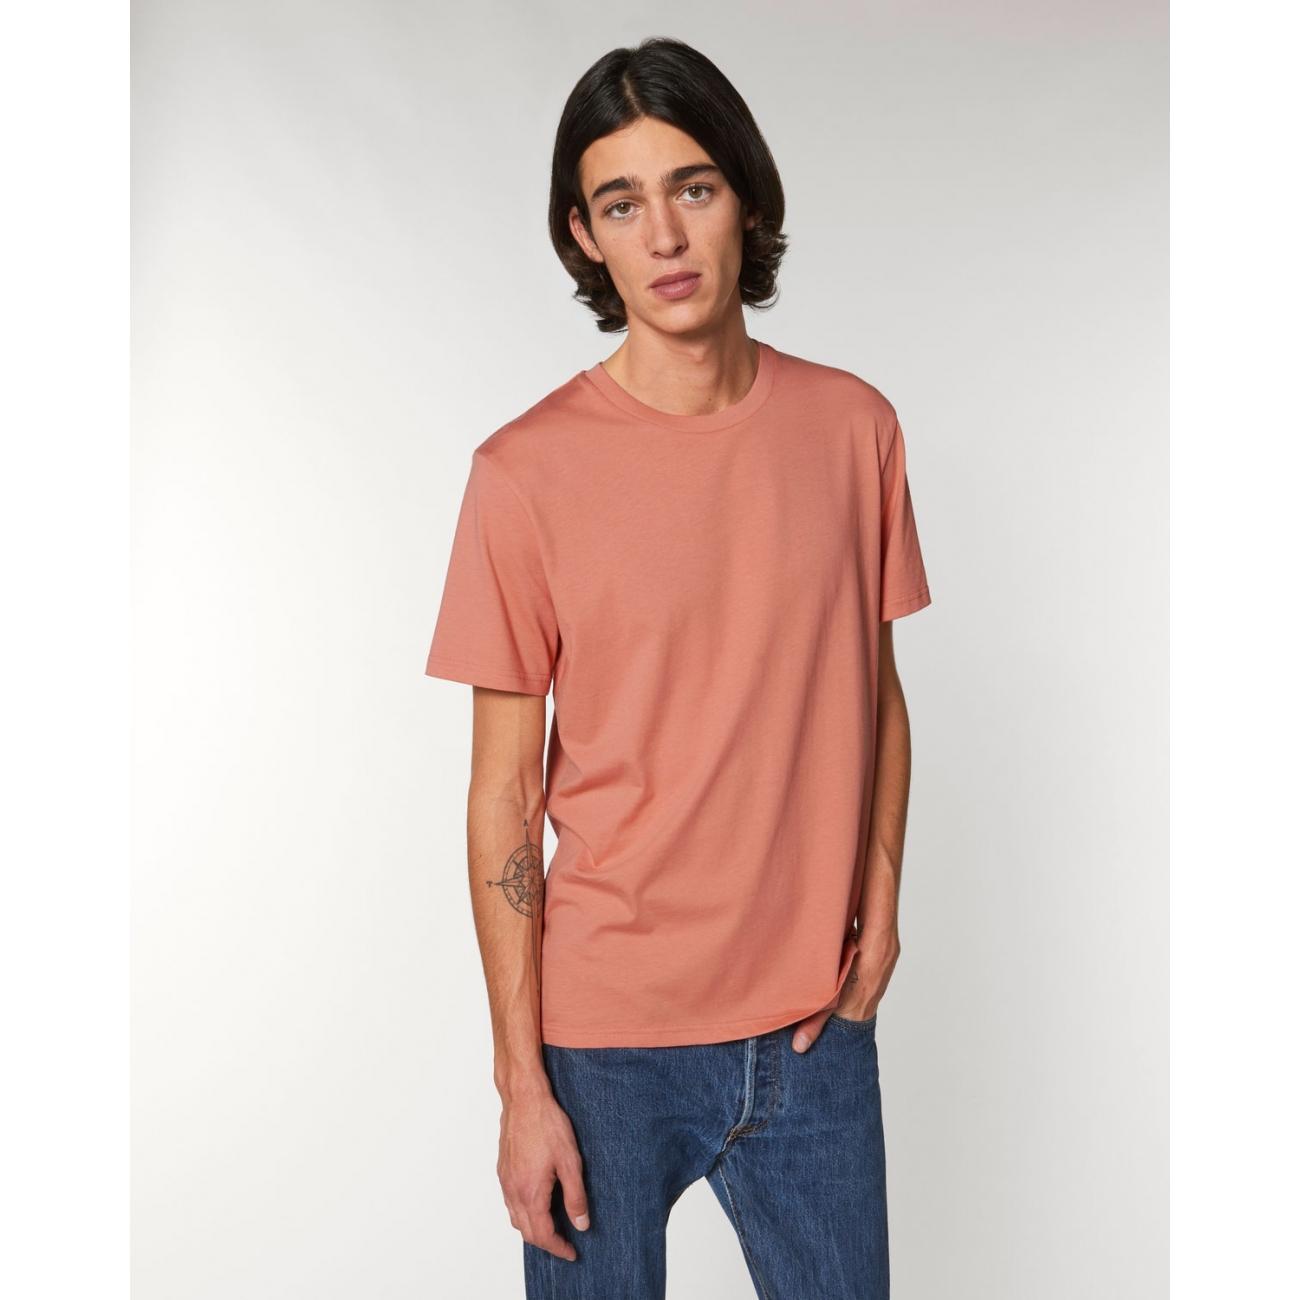 https://tee-shirt-bio.com/10282-thickbox_default/tee-shirt-homme-coton-bio-col-rond-coupe-classique-rose-peche.jpg